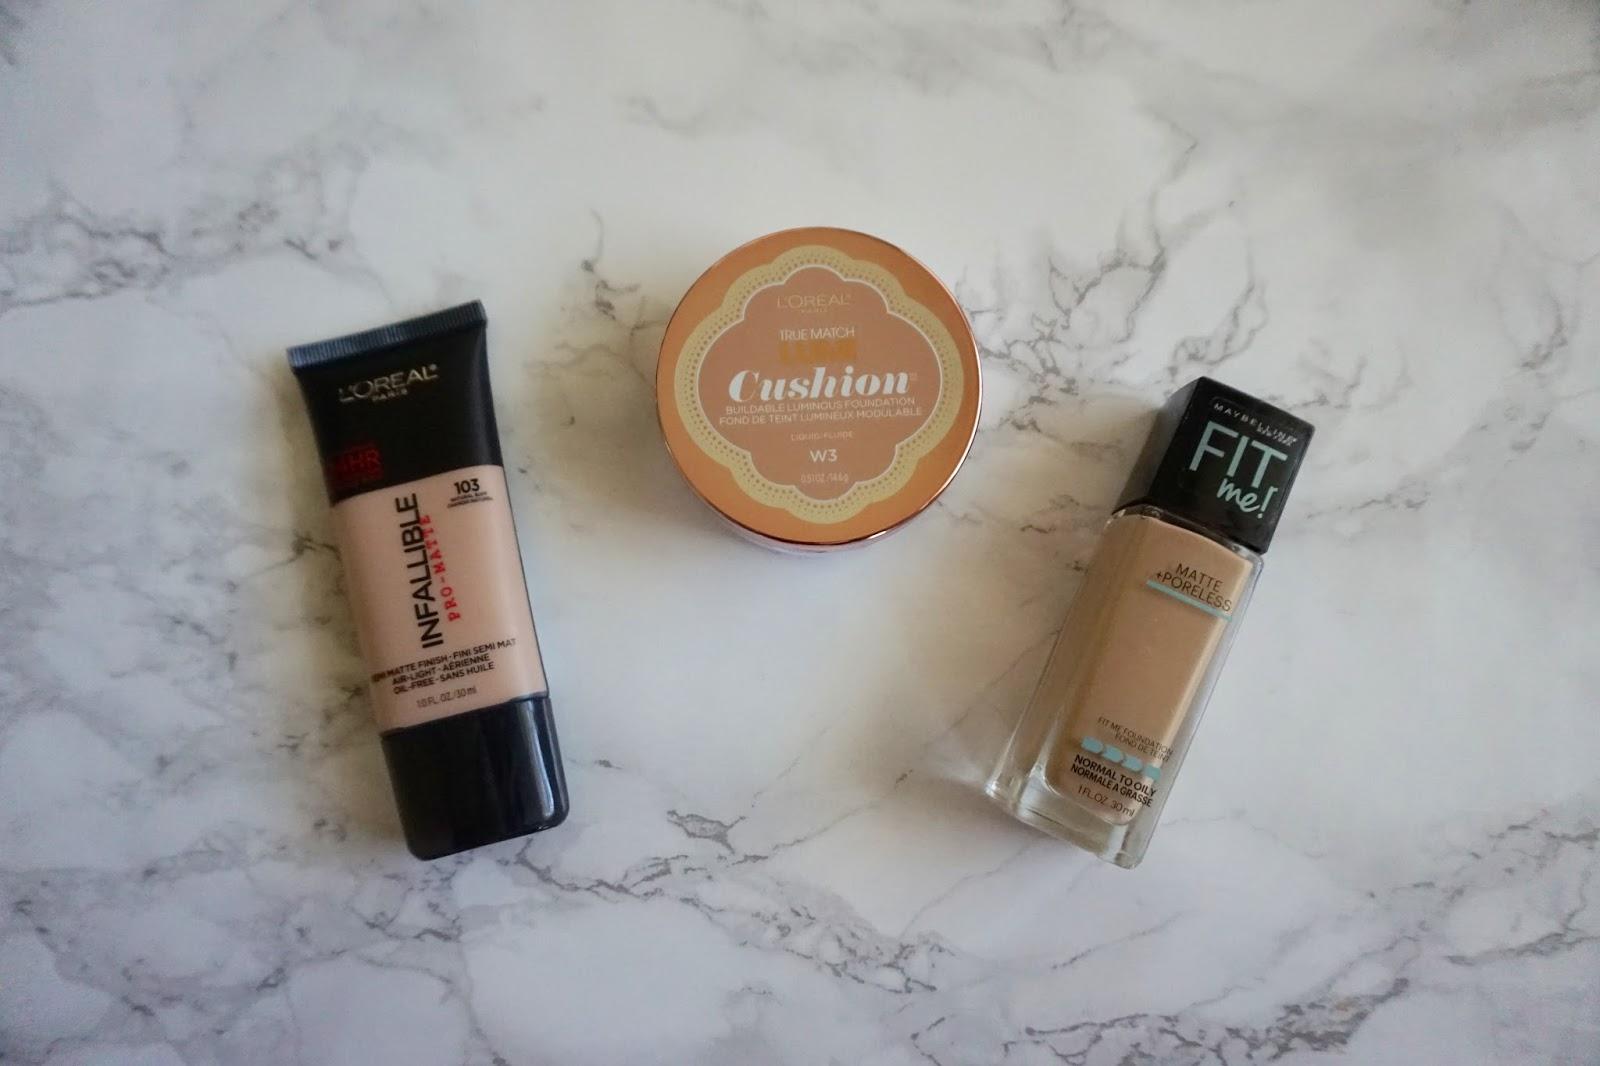 Mayme Brown Makeup Drugstore Foundations Loreal Lumi Cushion Buildable Luminous Foundation